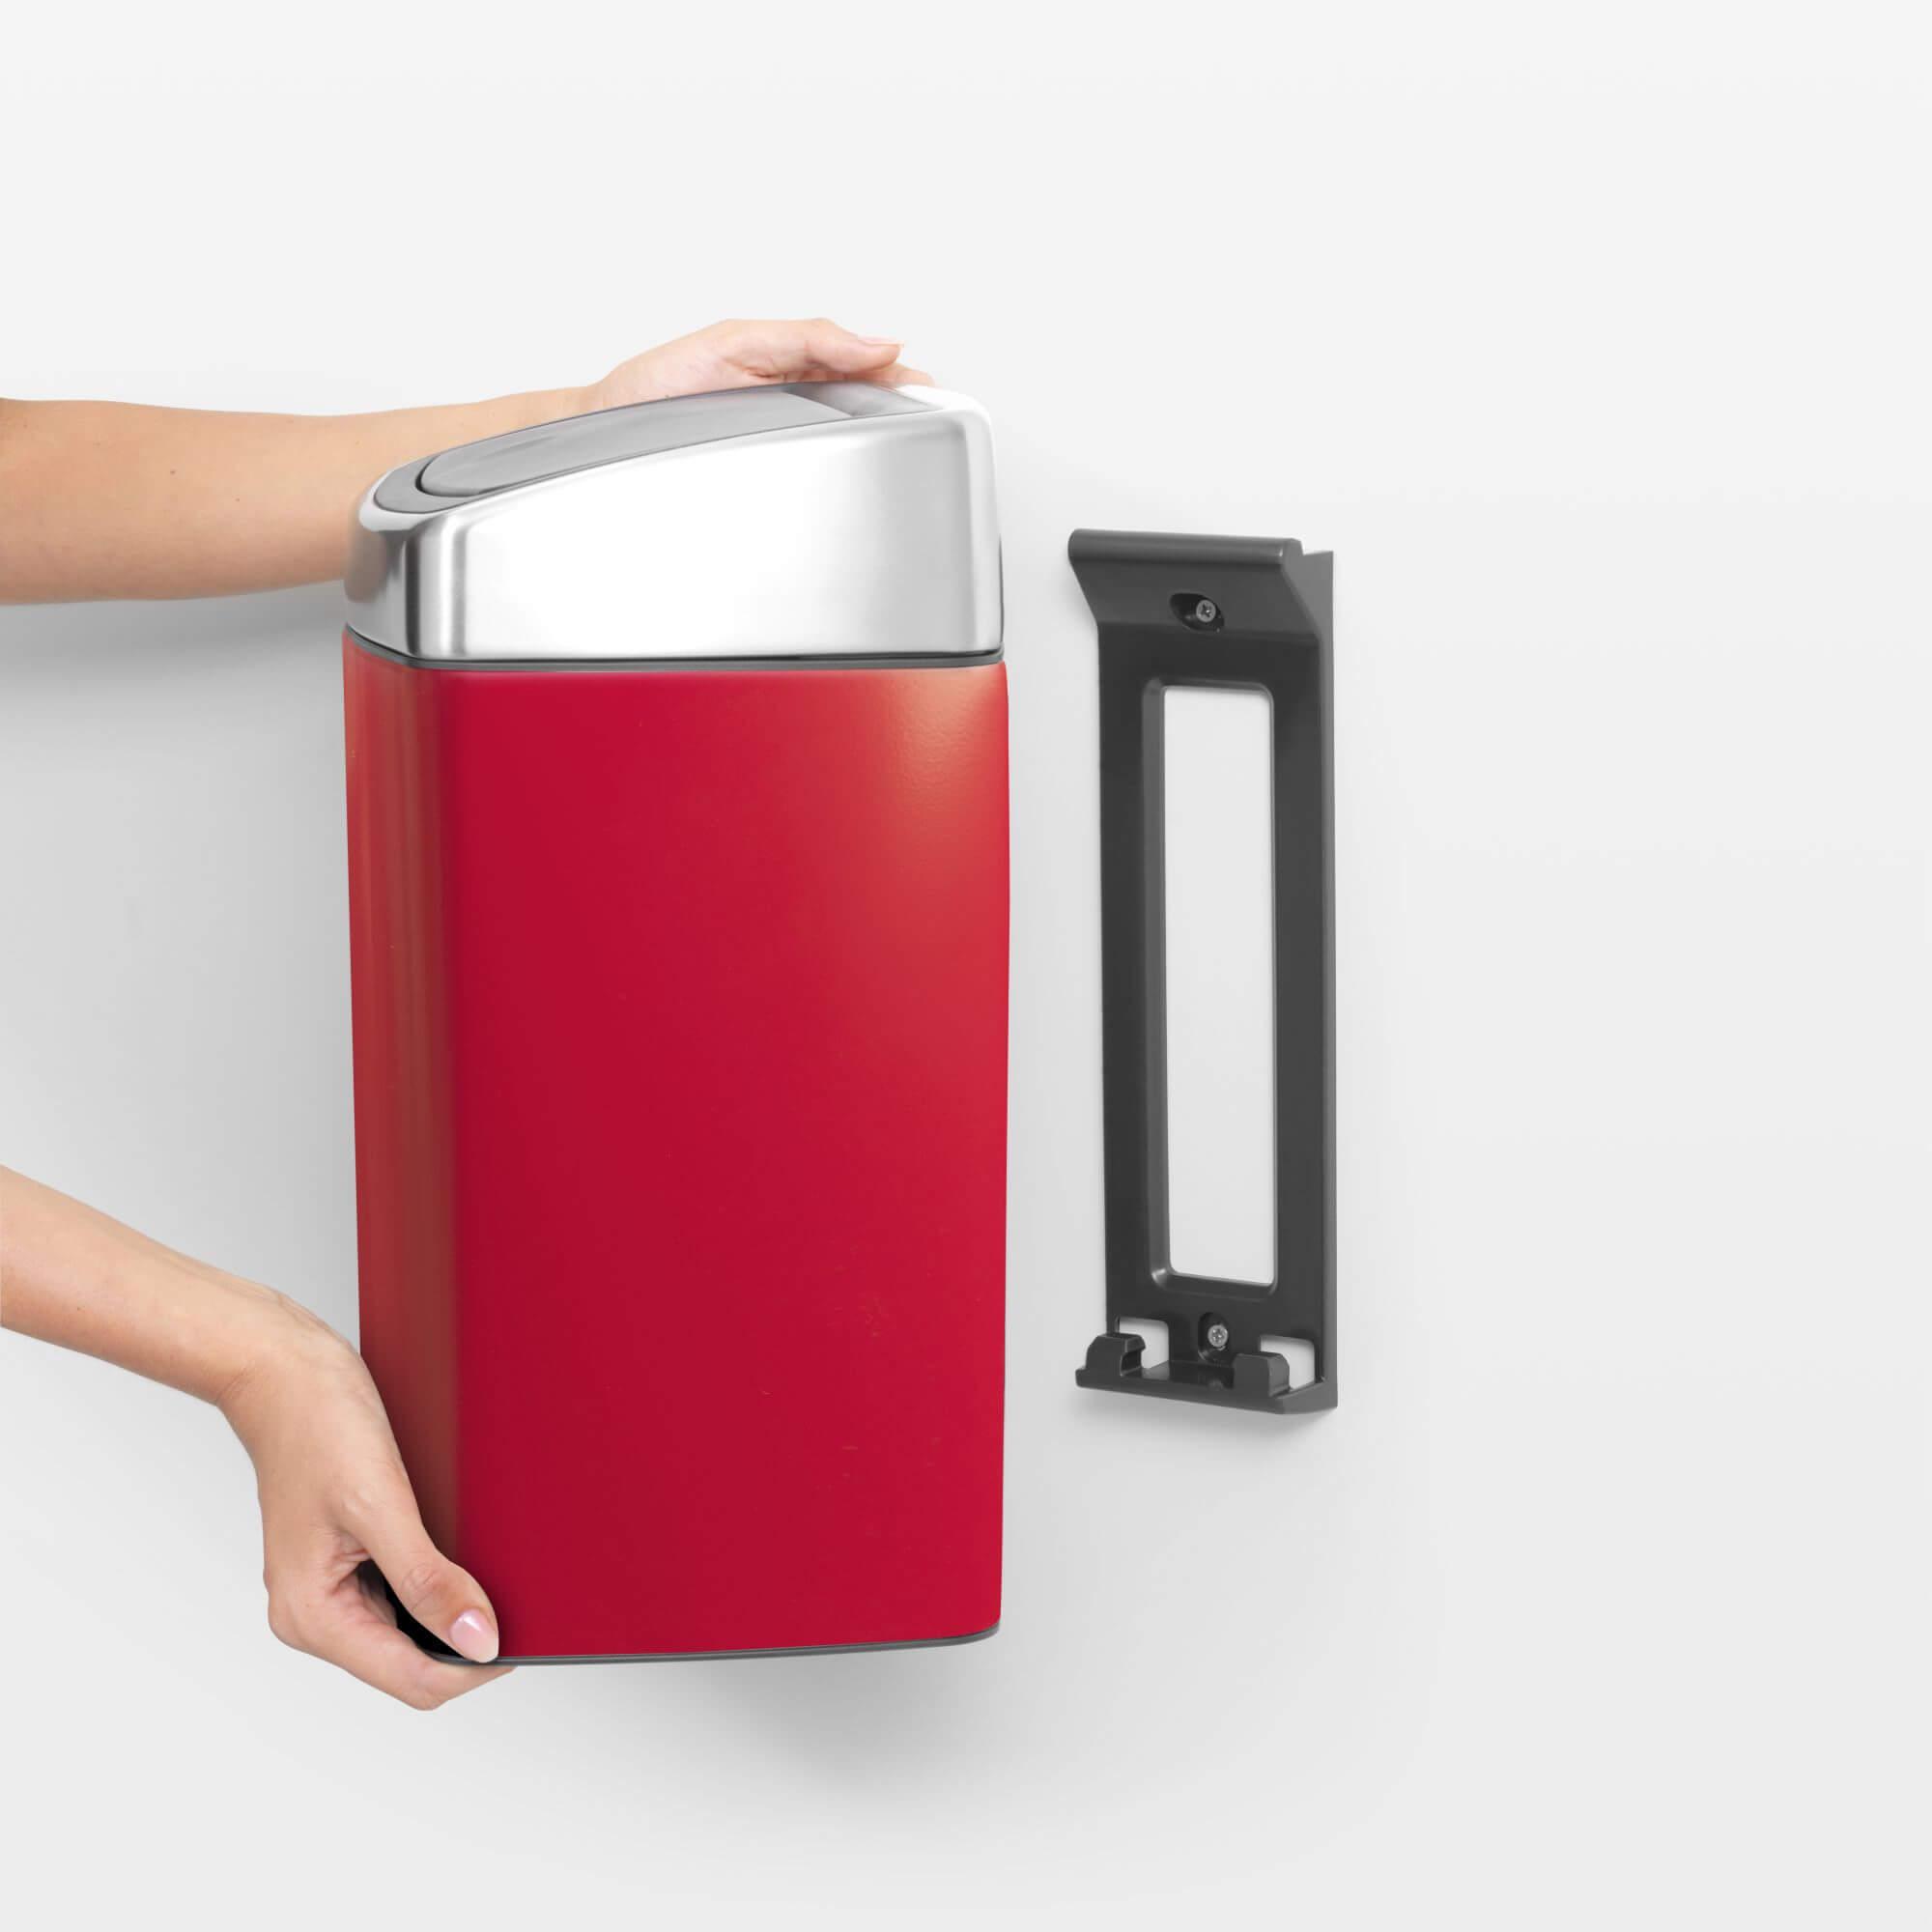 Prullenbak Brabantia Touch Bin 10 Liter.Brabantia Touch Bin 10 Liter Passion Red Brabantia Touch Bin 10 Liter Passion Red